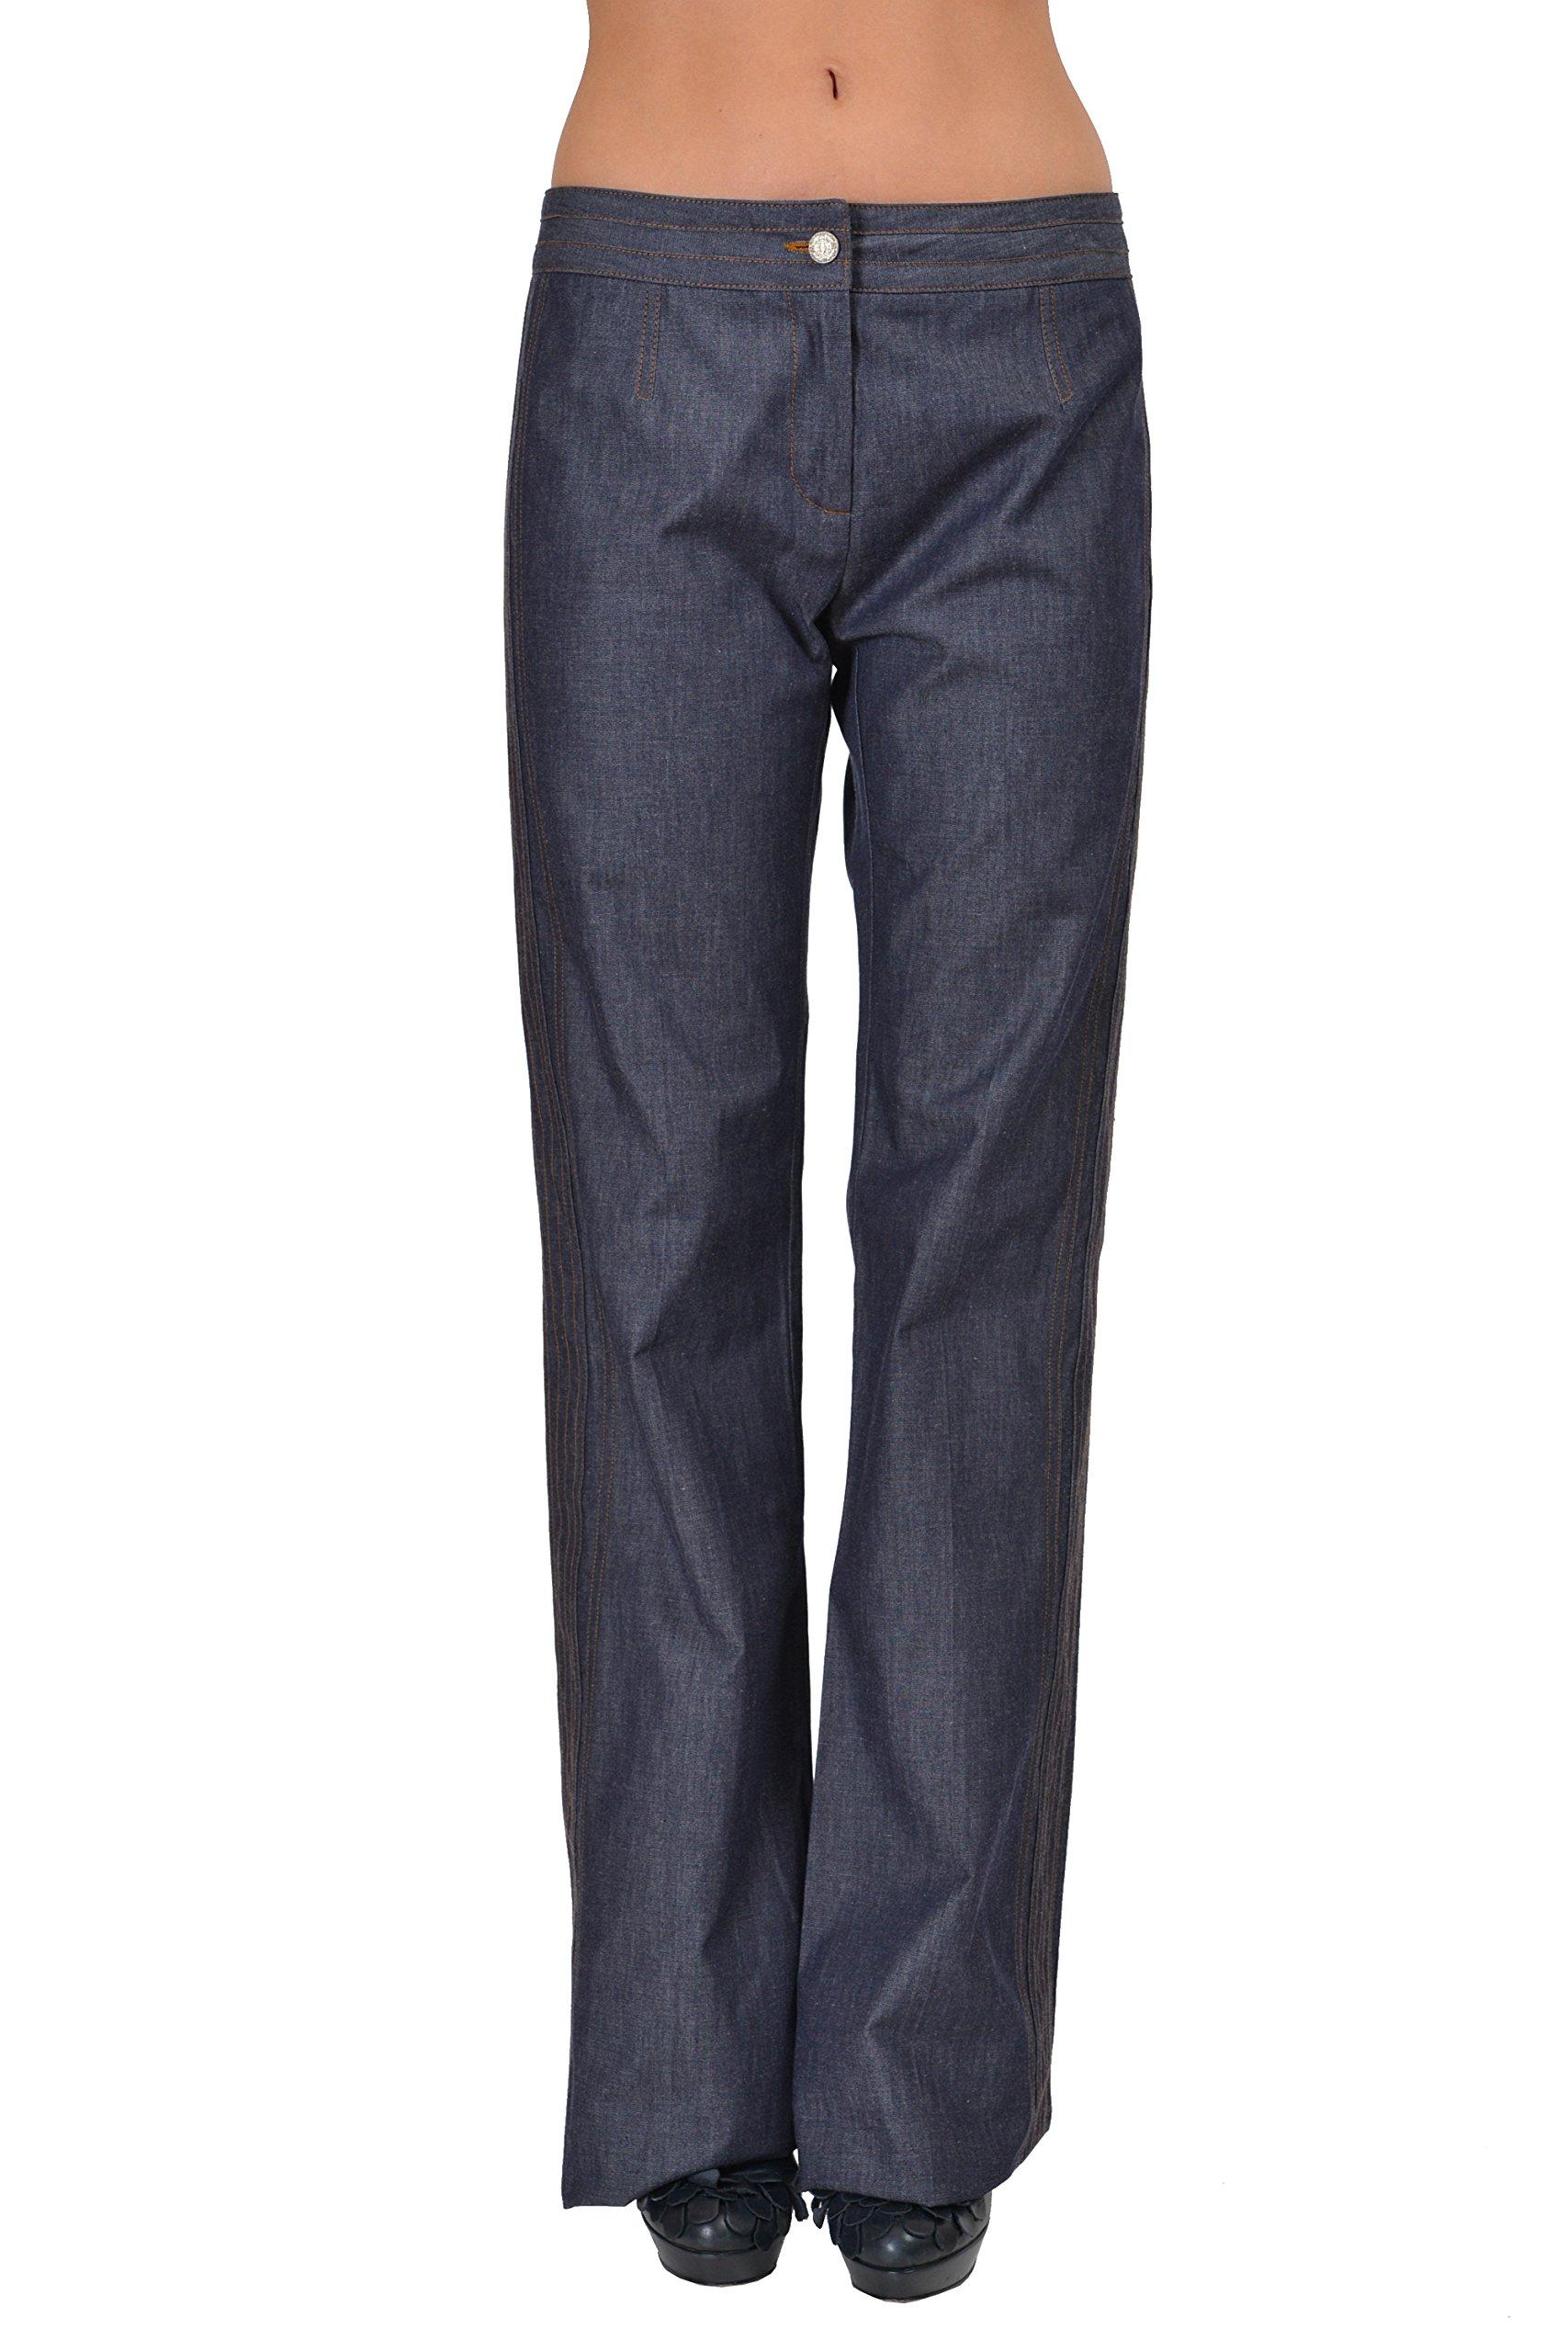 Just Cavalli Women's Blue Boot Cut Casual Pants US 4 IT 40